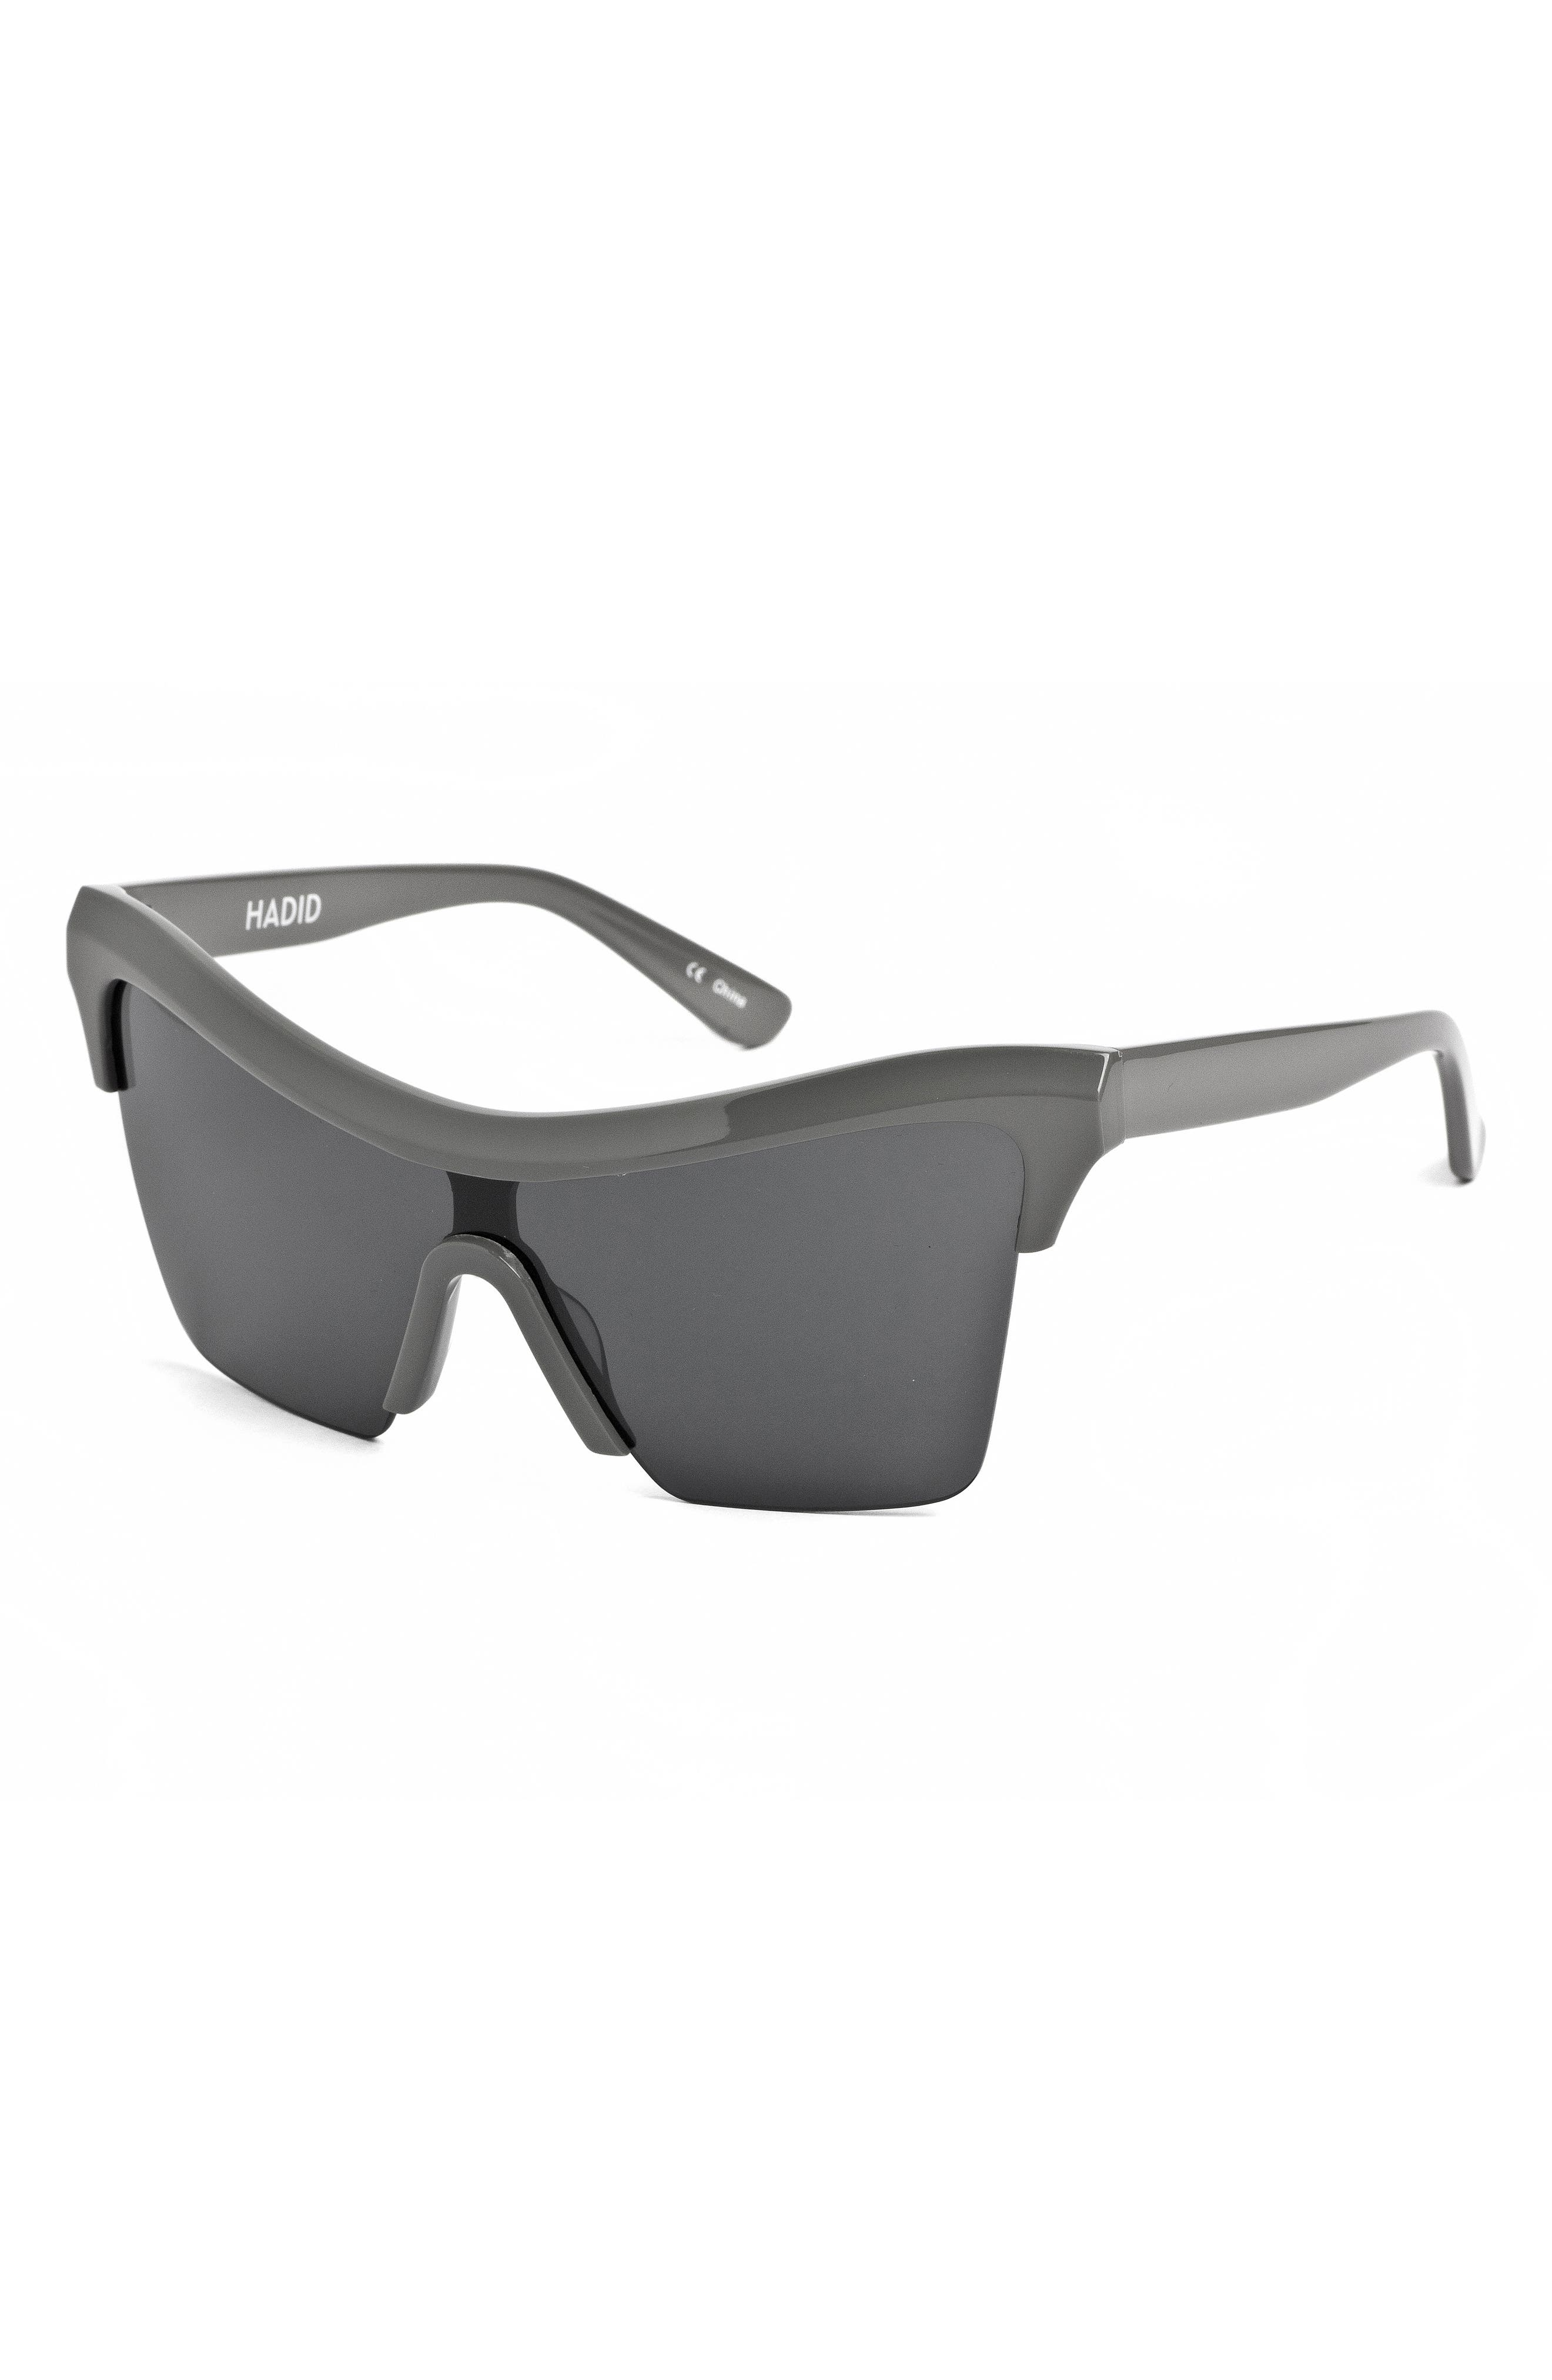 Passport Control 68mm Sunglasses,                             Alternate thumbnail 4, color,                             Grey